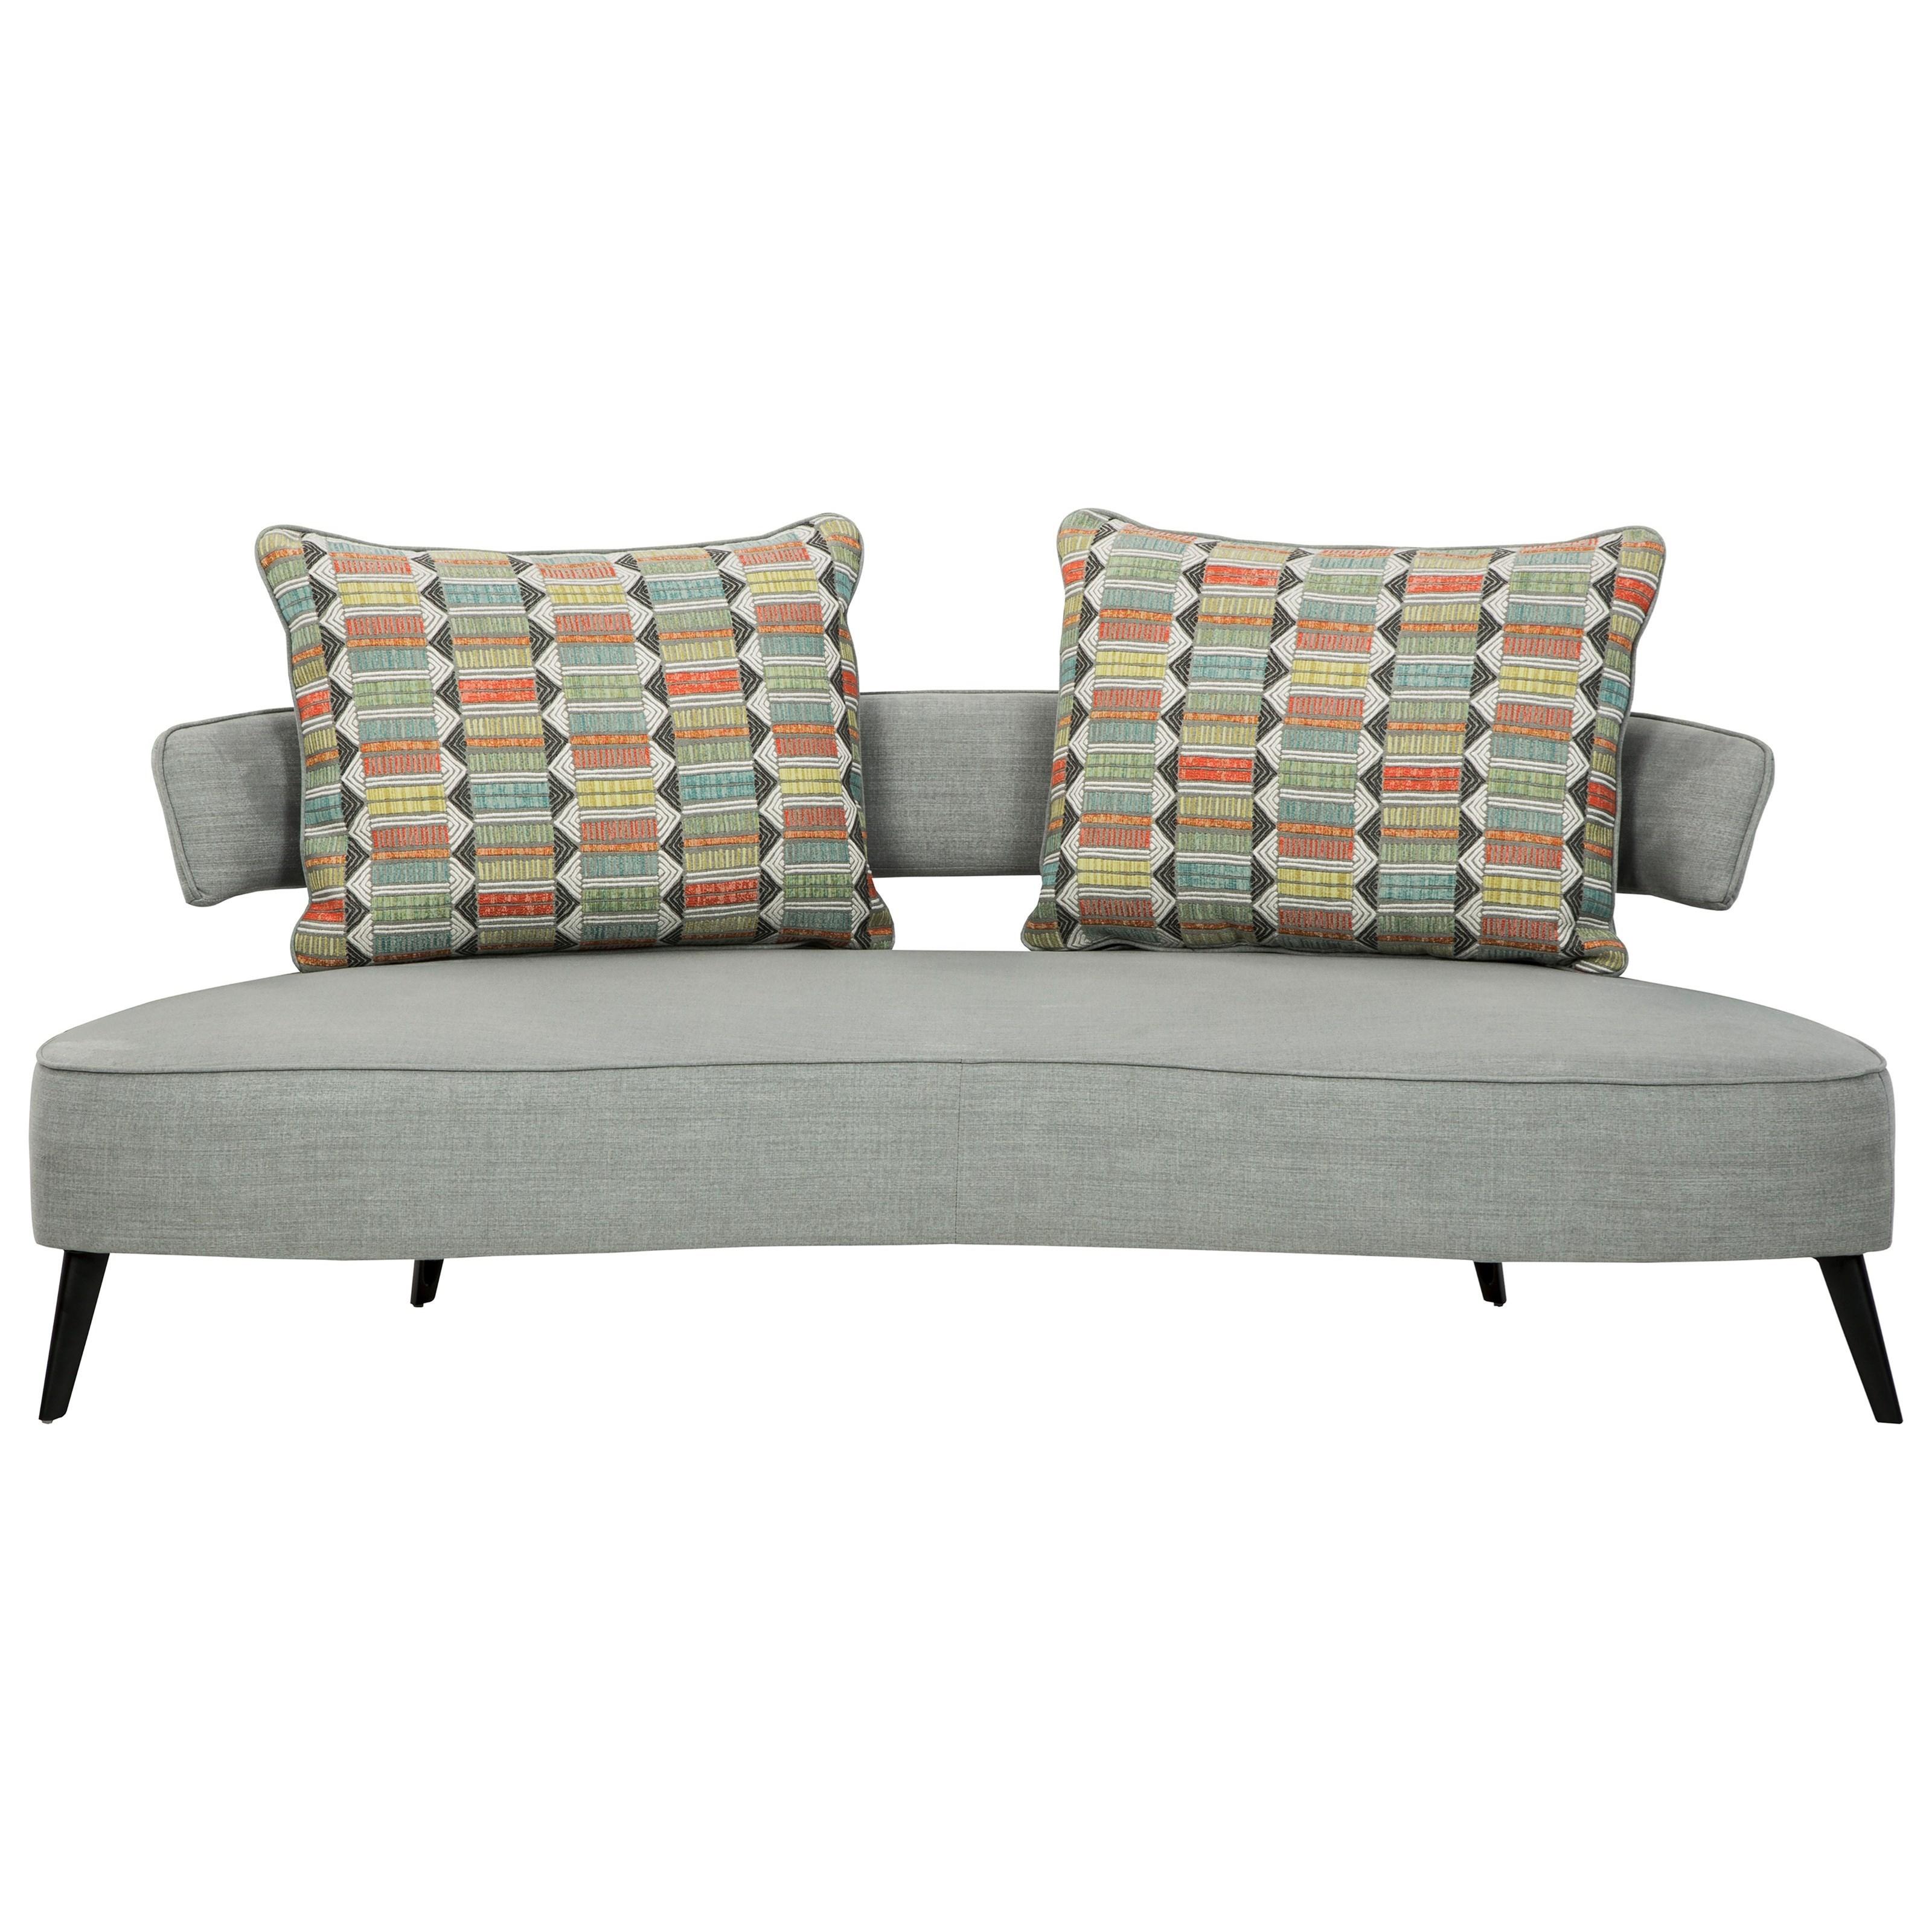 Hollyann Sofa by Ashley (Signature Design) at Johnny Janosik